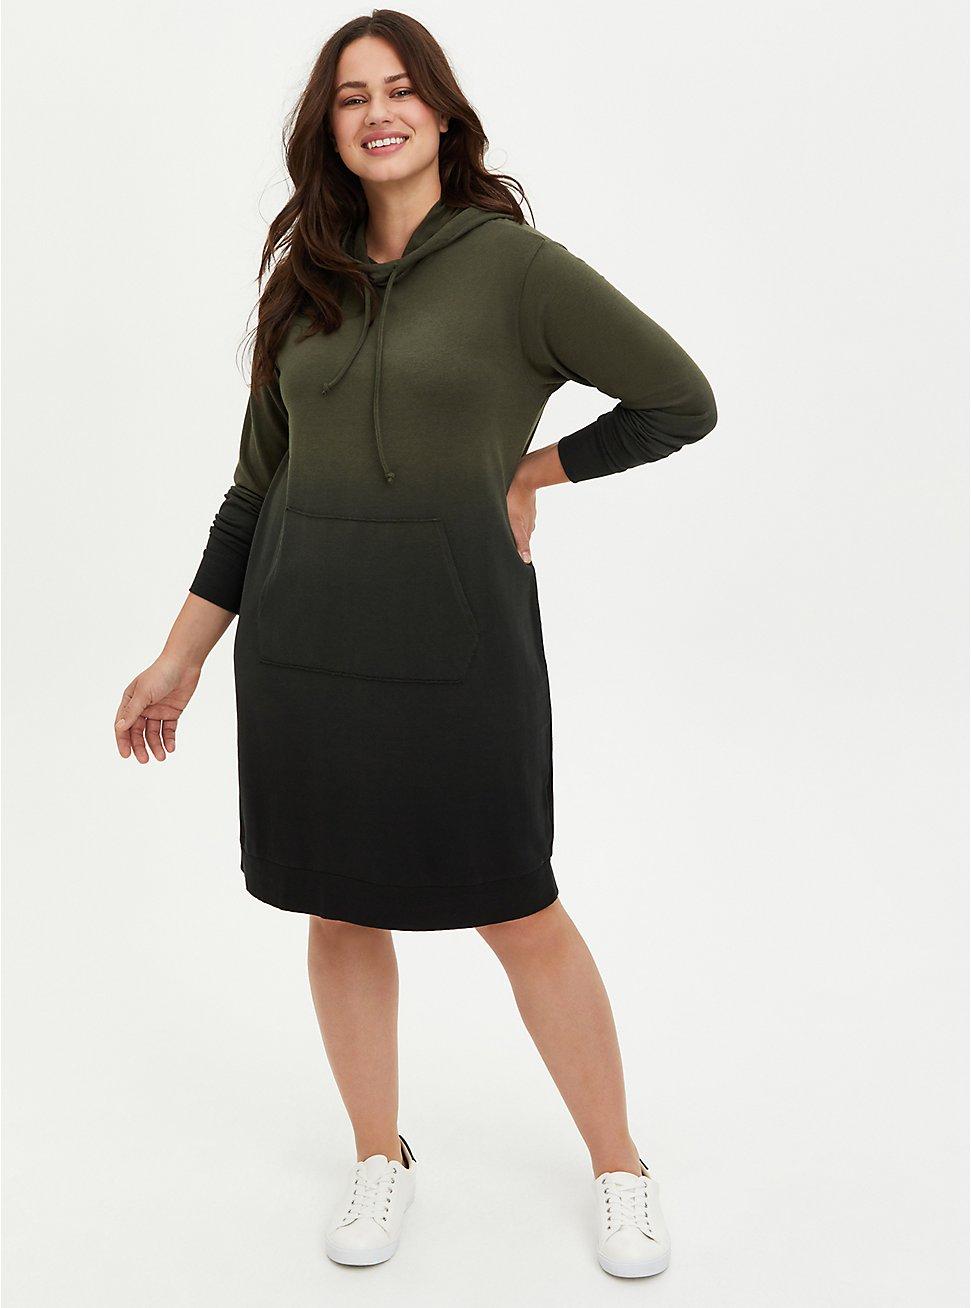 Hoodie Dress - French Terry Olive Dip Dye, , hi-res